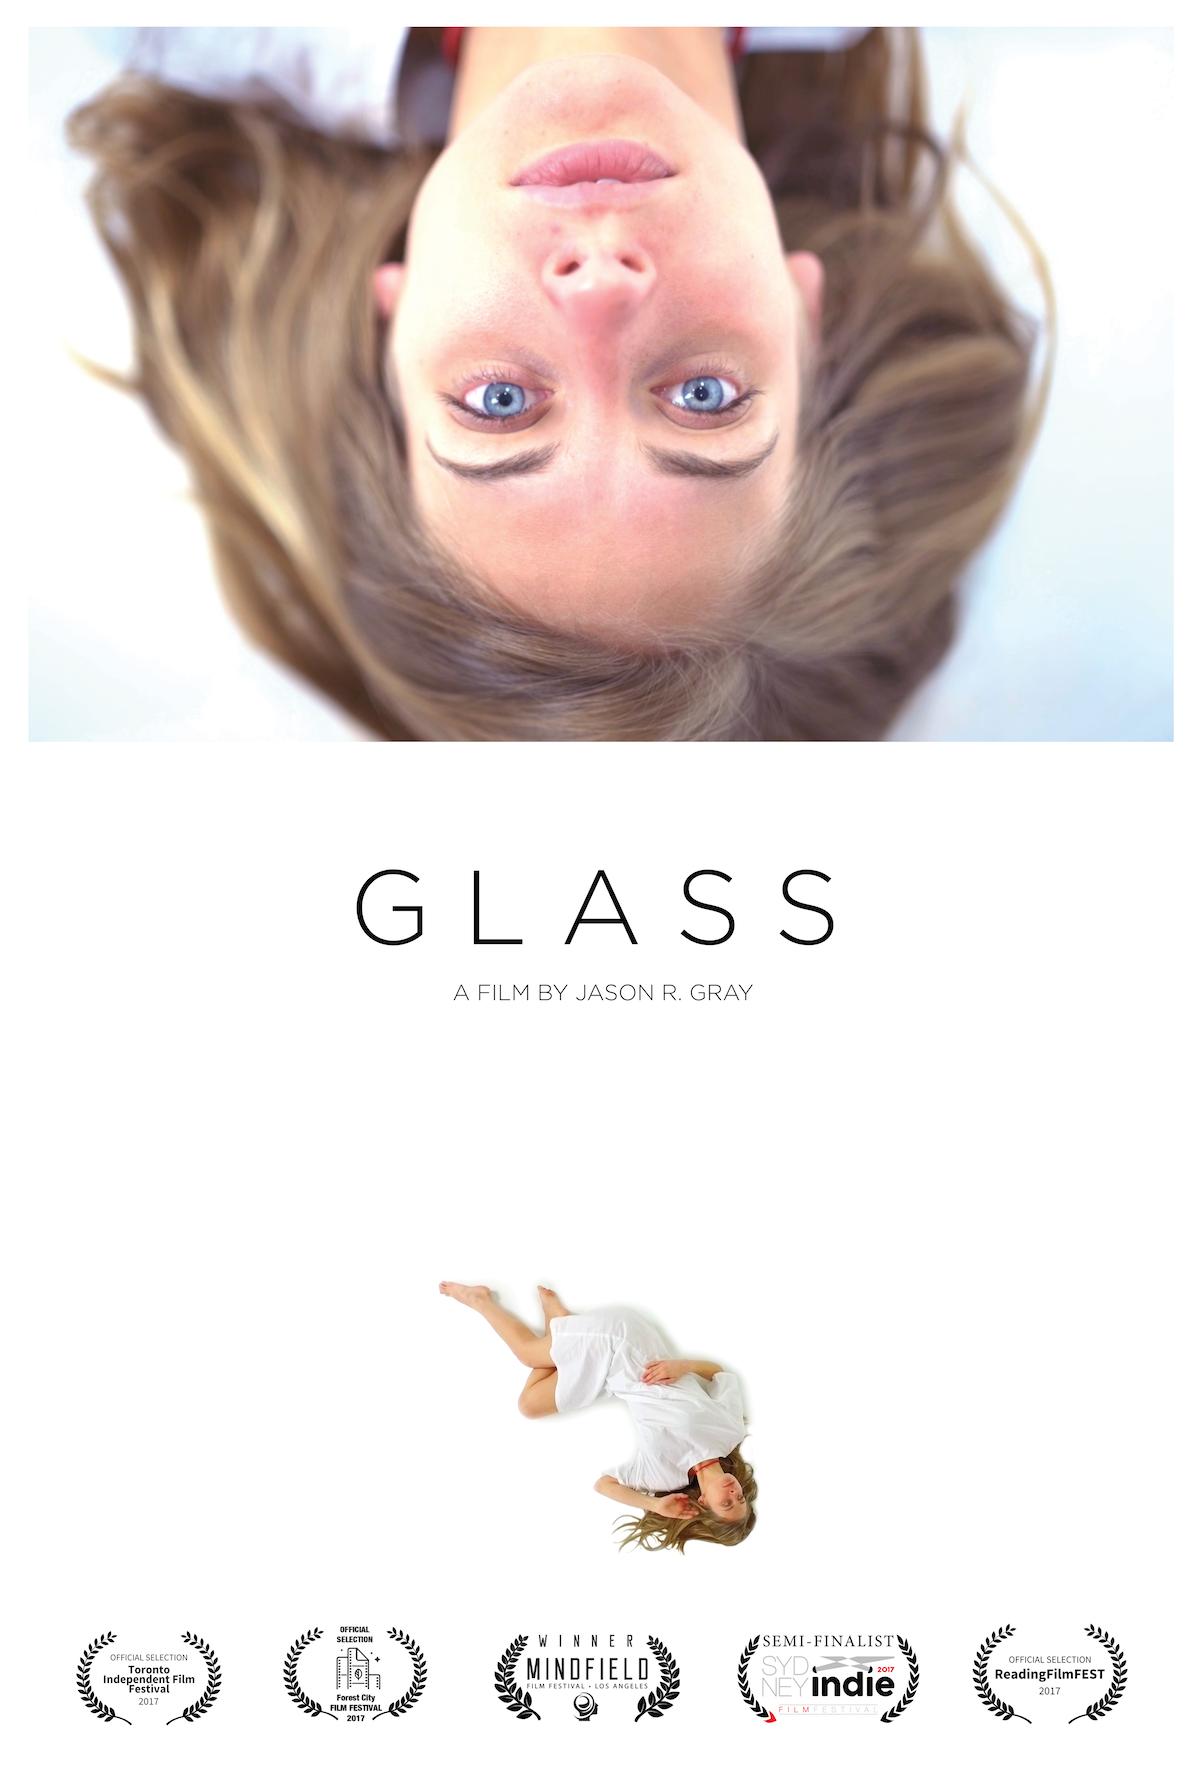 GLASS_White_full_Laurels.png